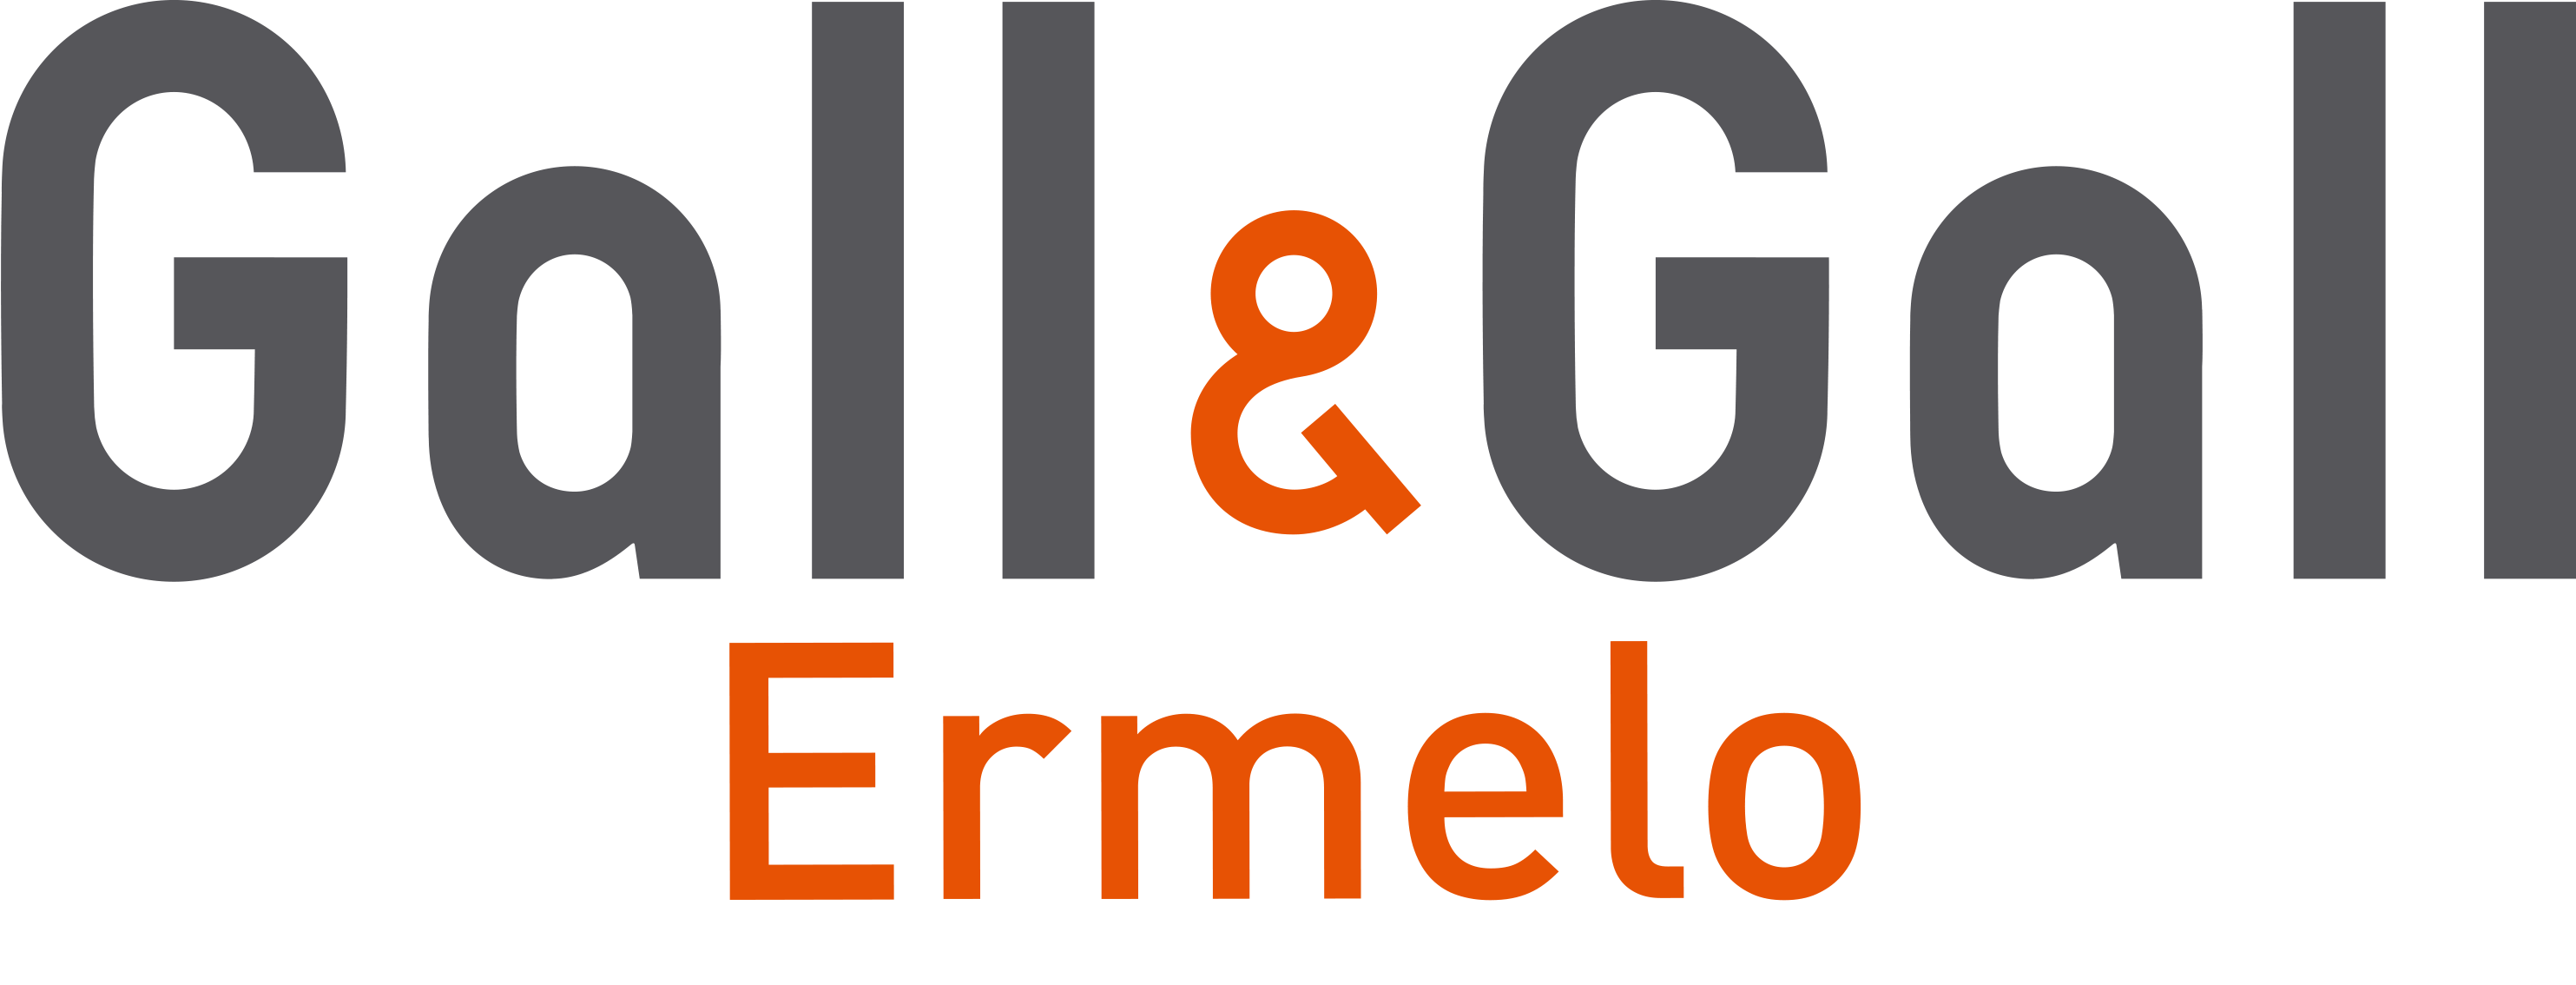 Gall & Gall Ermelo logo